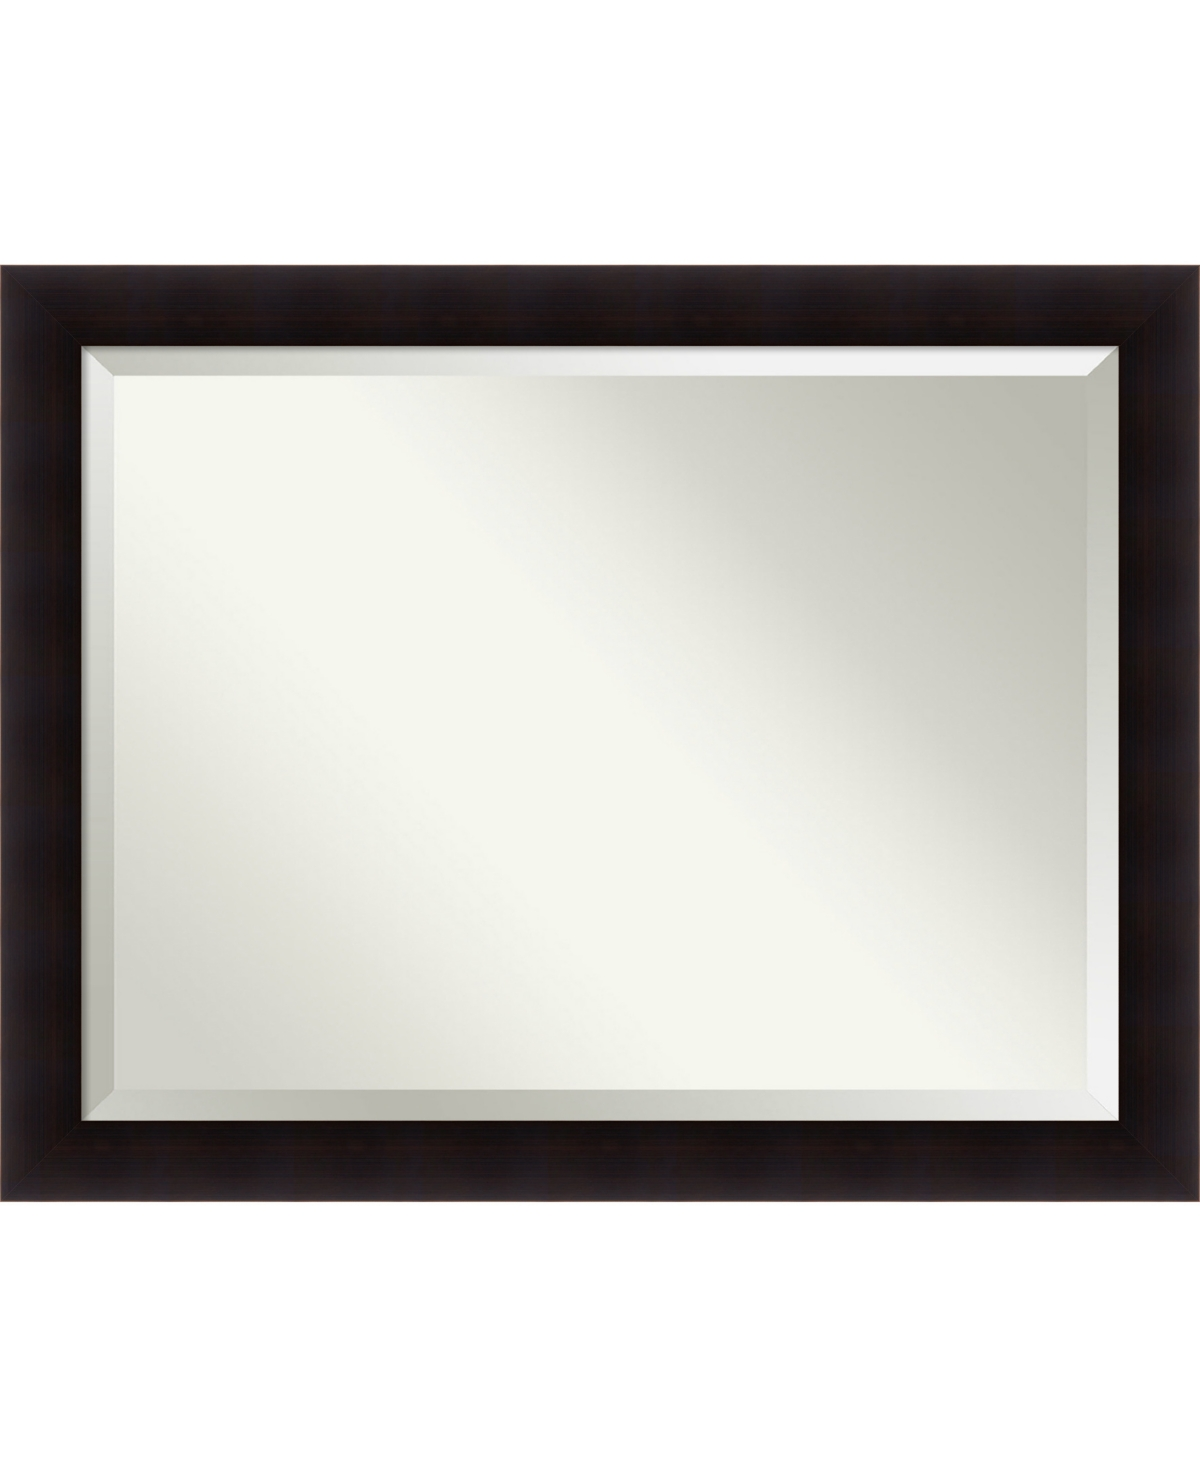 Amanti Art Portico 46x36 Bathroom Mirror